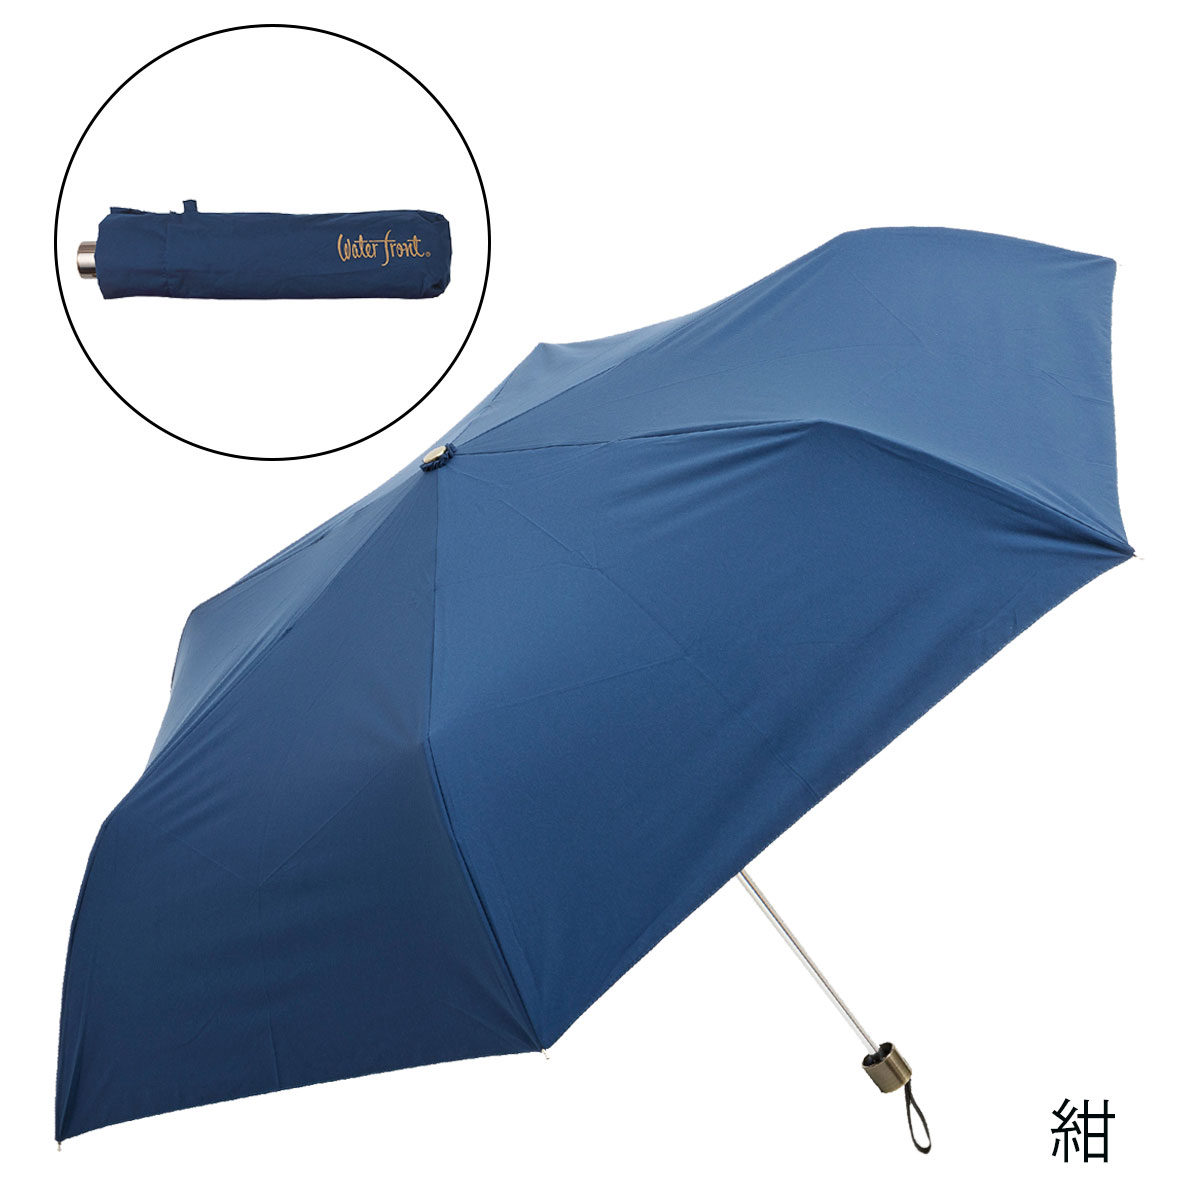 waterfront UVカット耐風折り畳み傘 包装箱入り